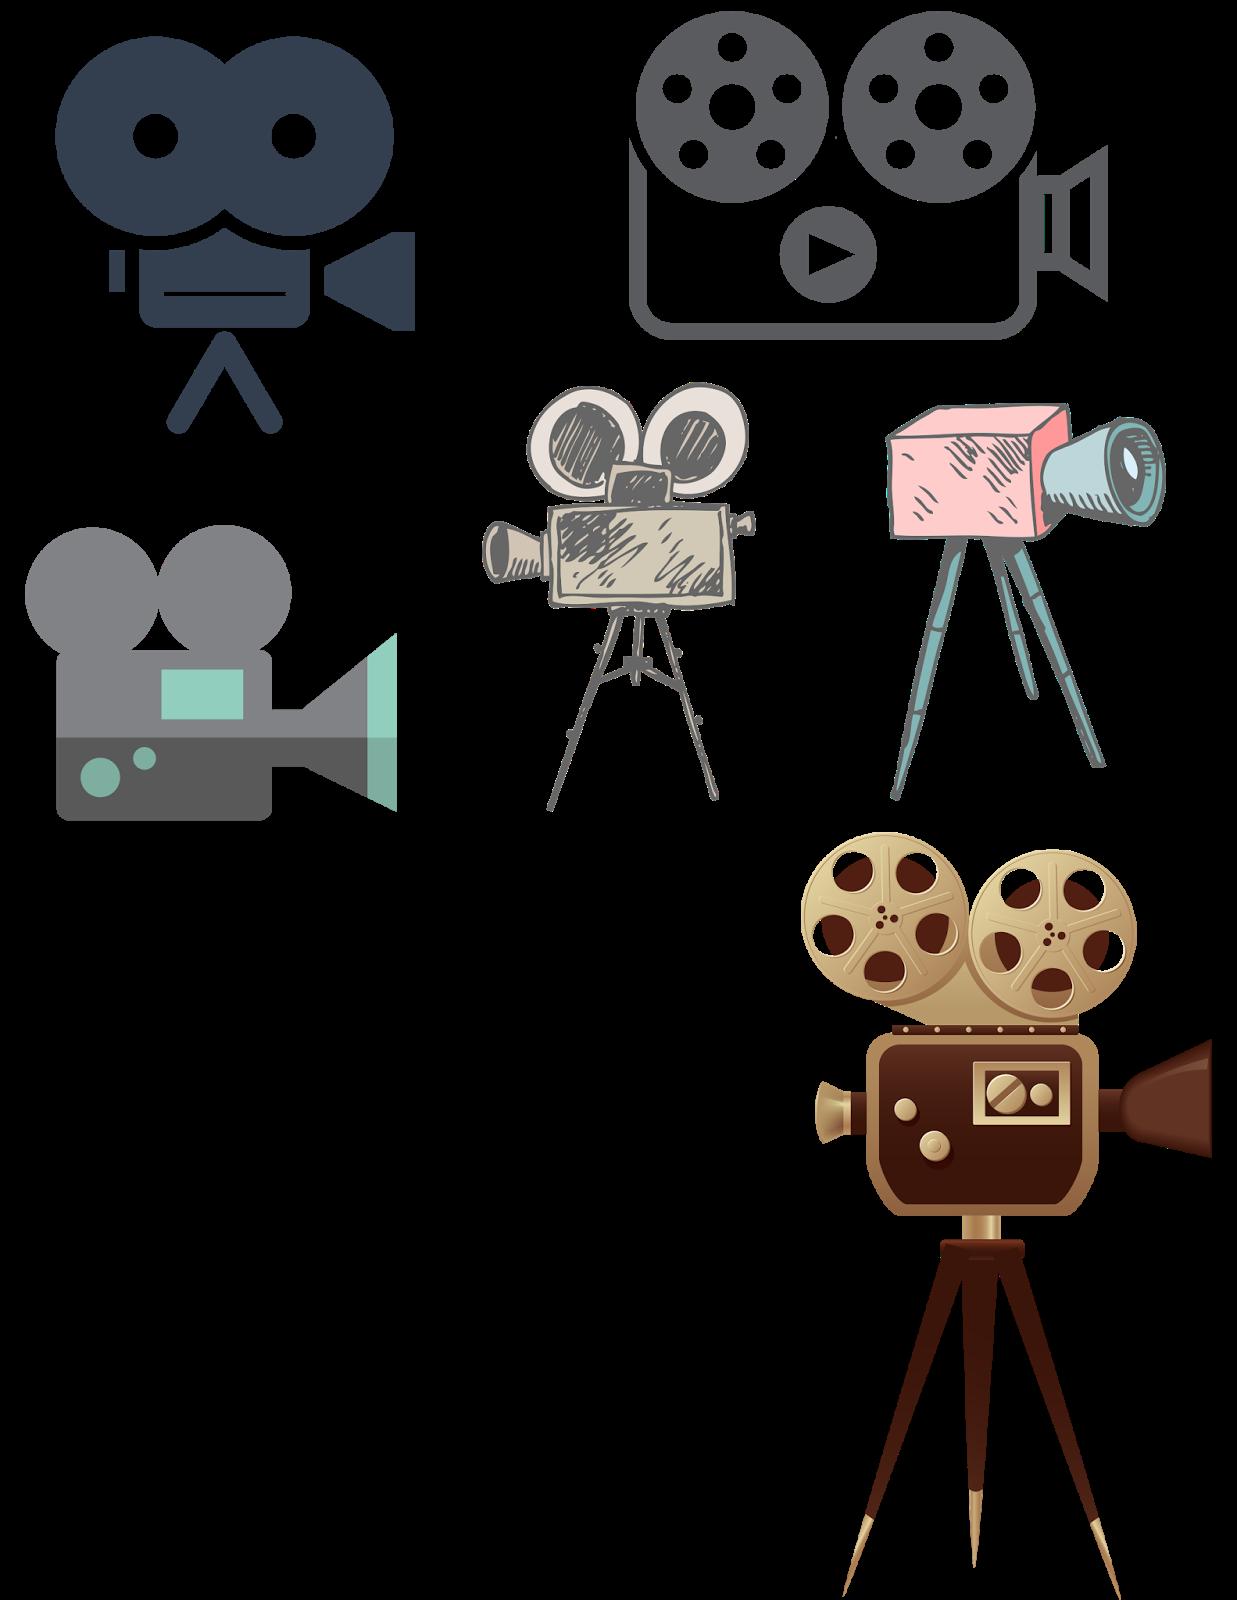 Hollywood clipart vintage video camera. Cosas en png proyectores